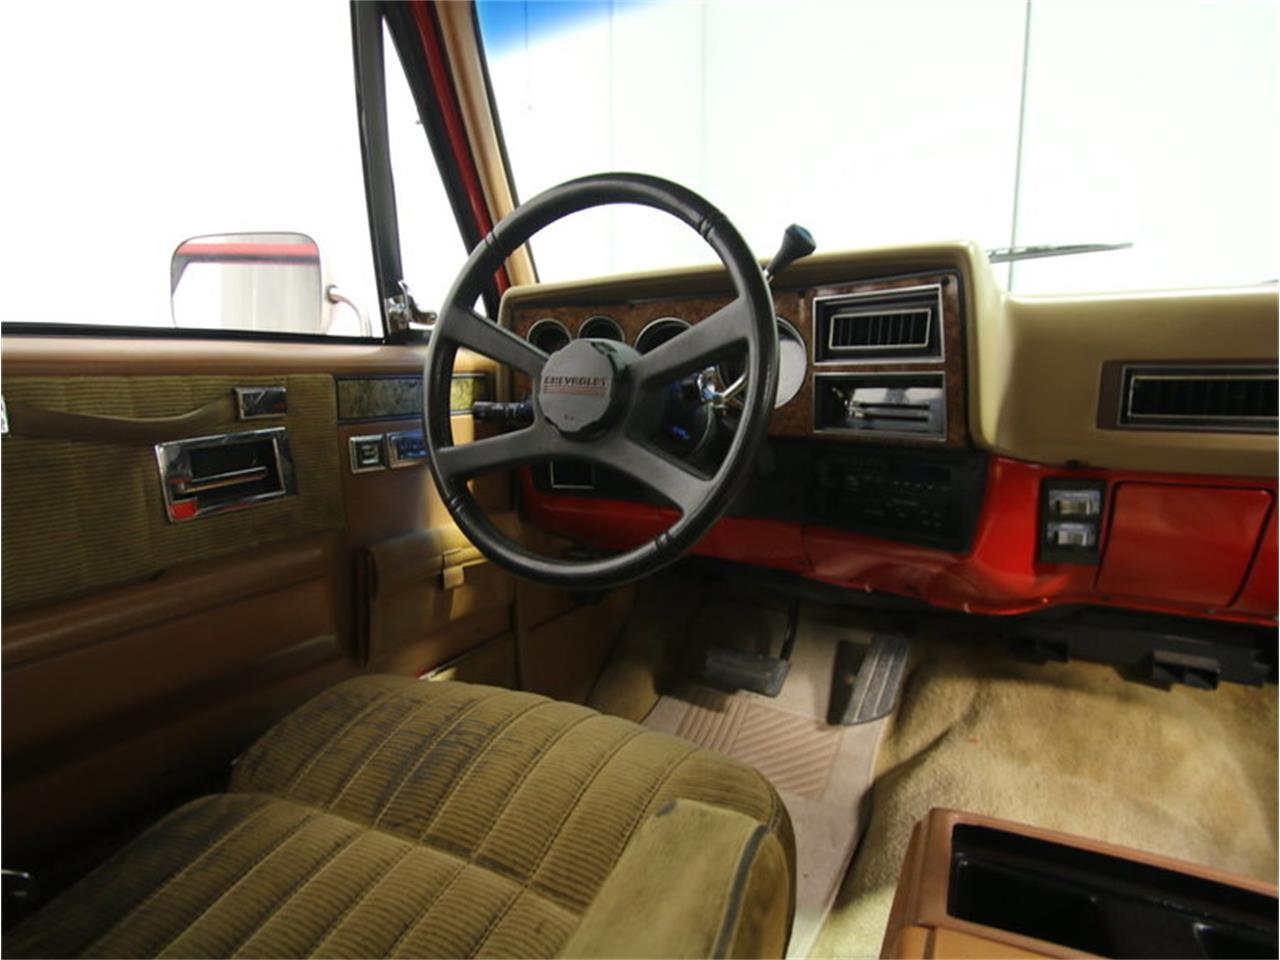 Large Picture of 1985 Chevrolet Suburban - $11,995.00 - KIU1